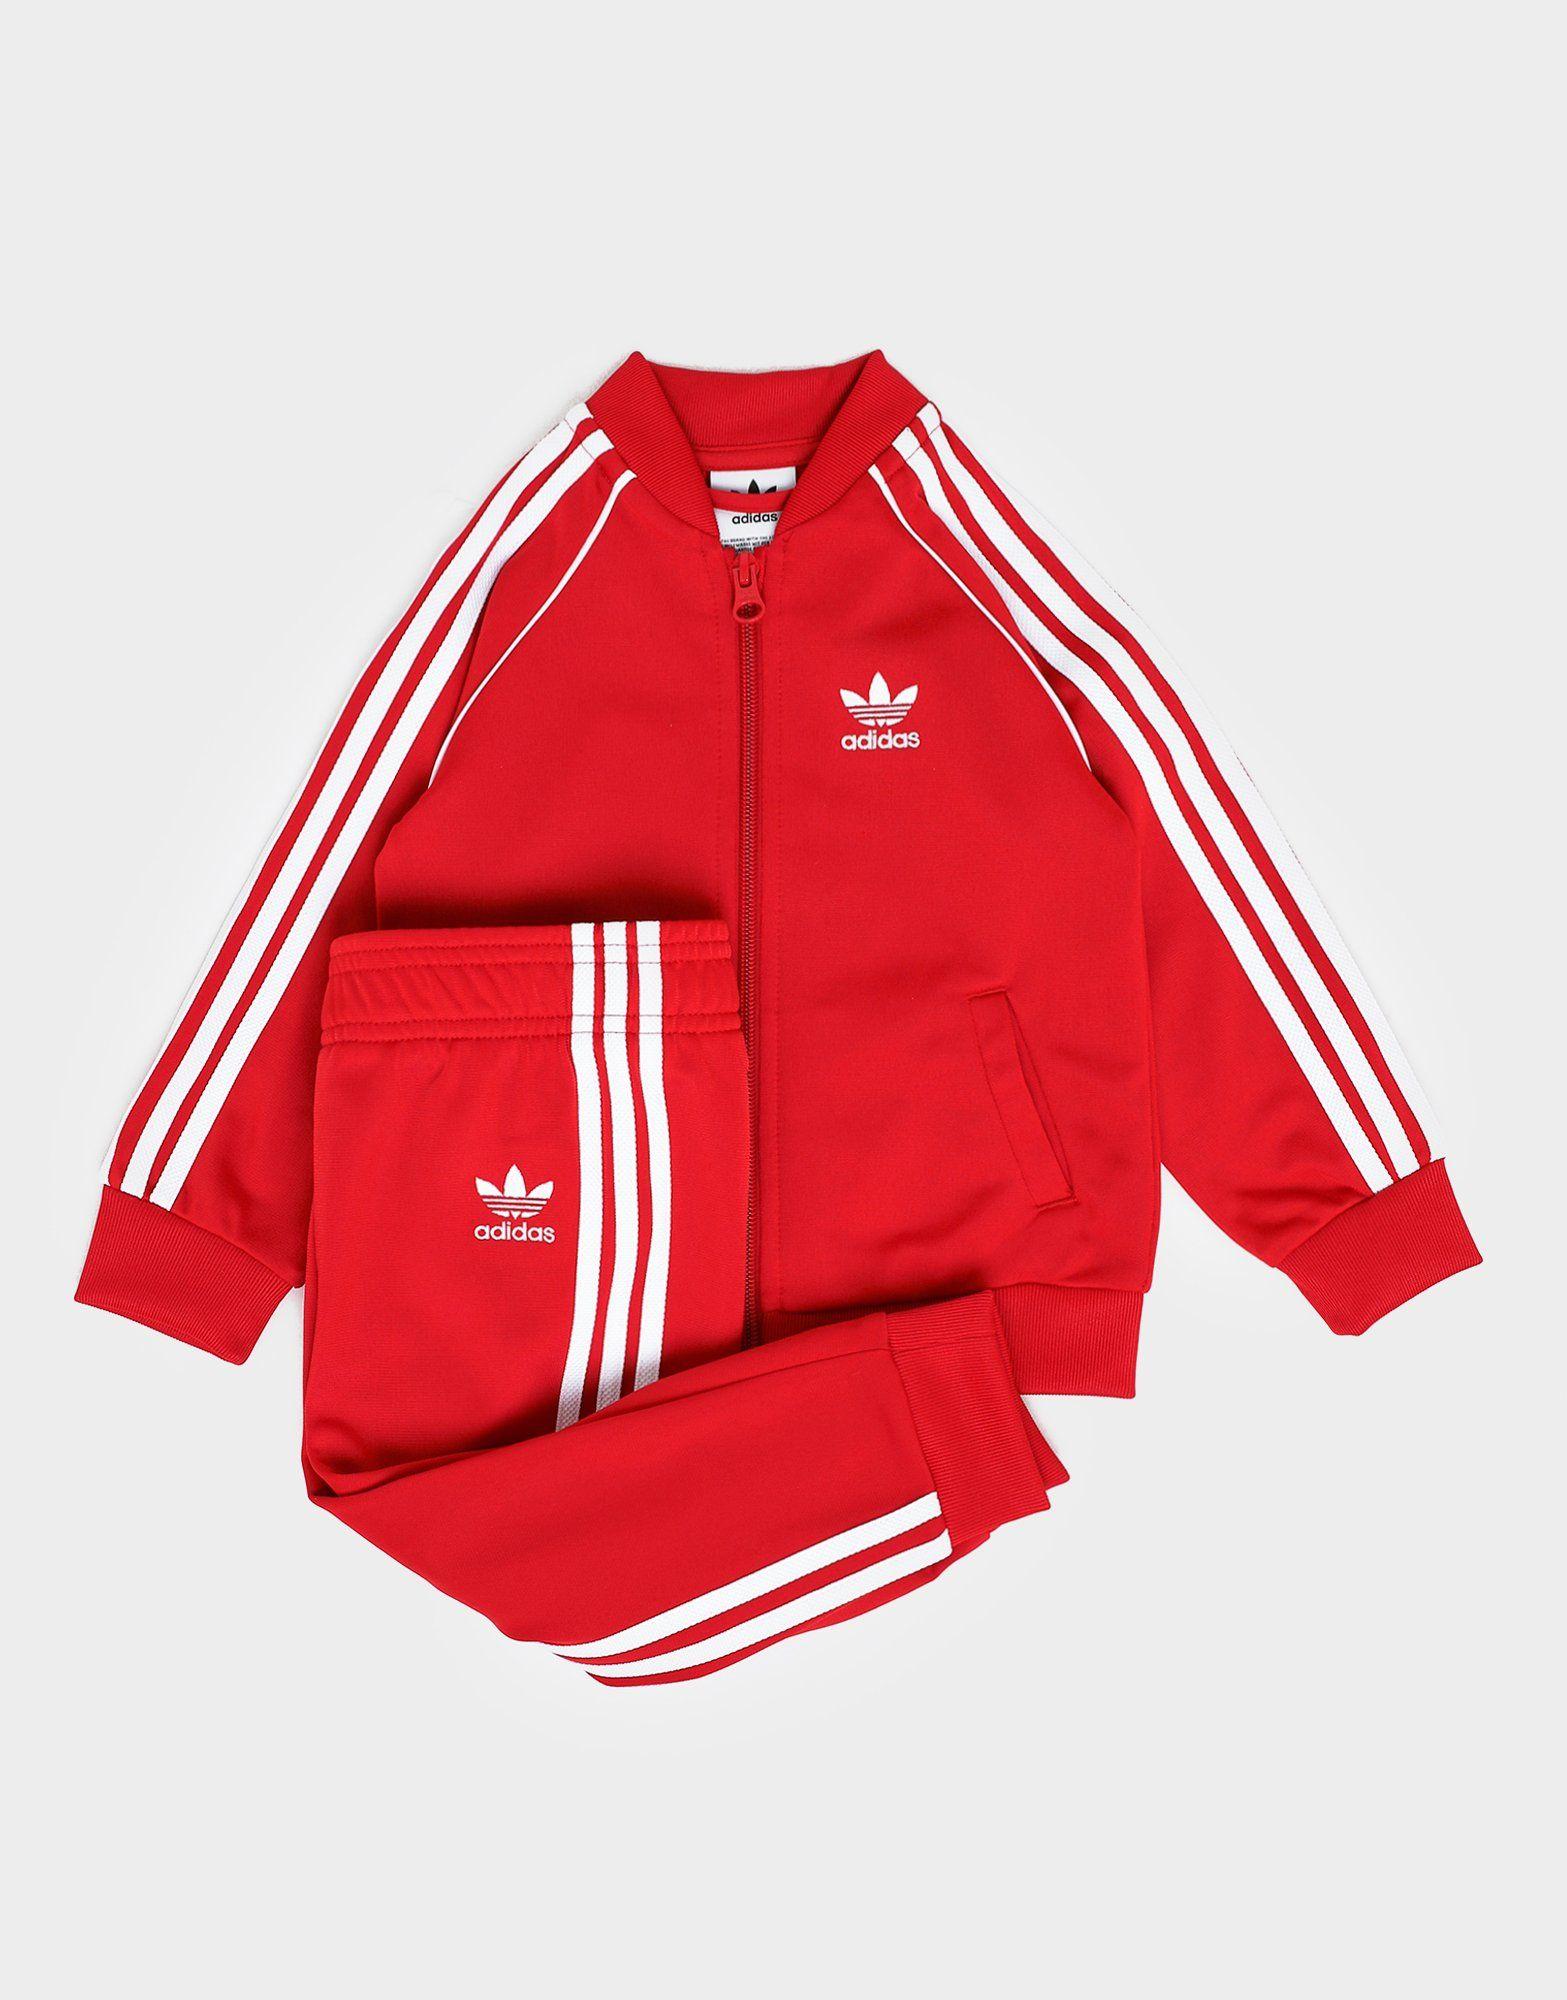 Adidas Originals Sst Tracksuit by Adidas Originals